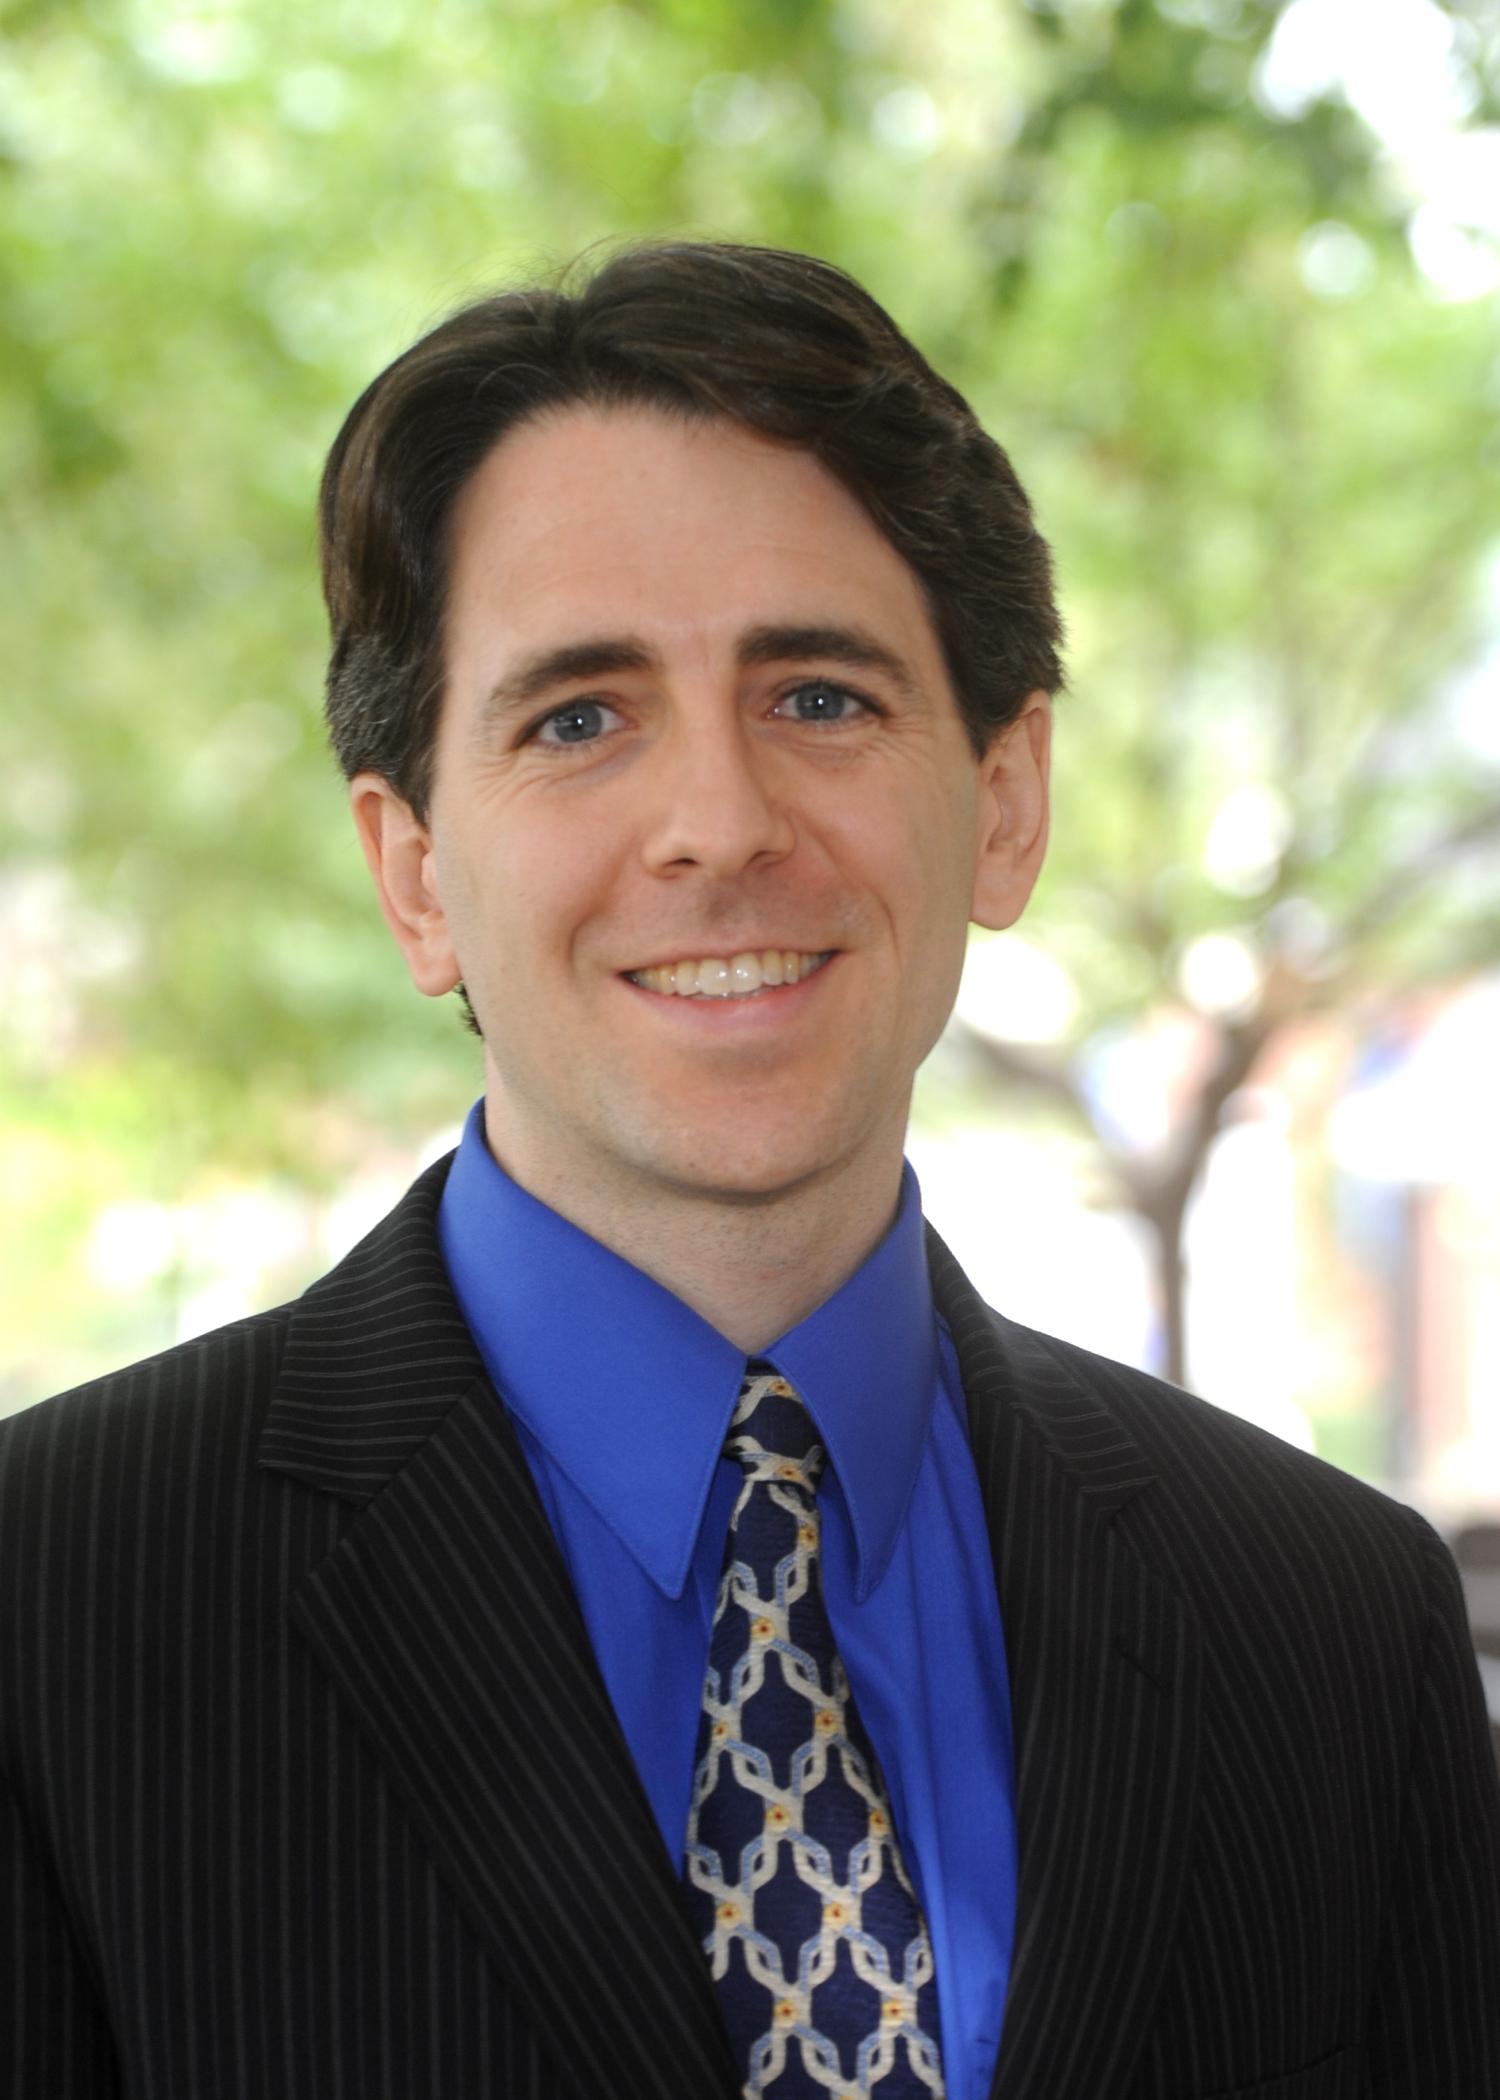 David Steib, Language Access Program Director